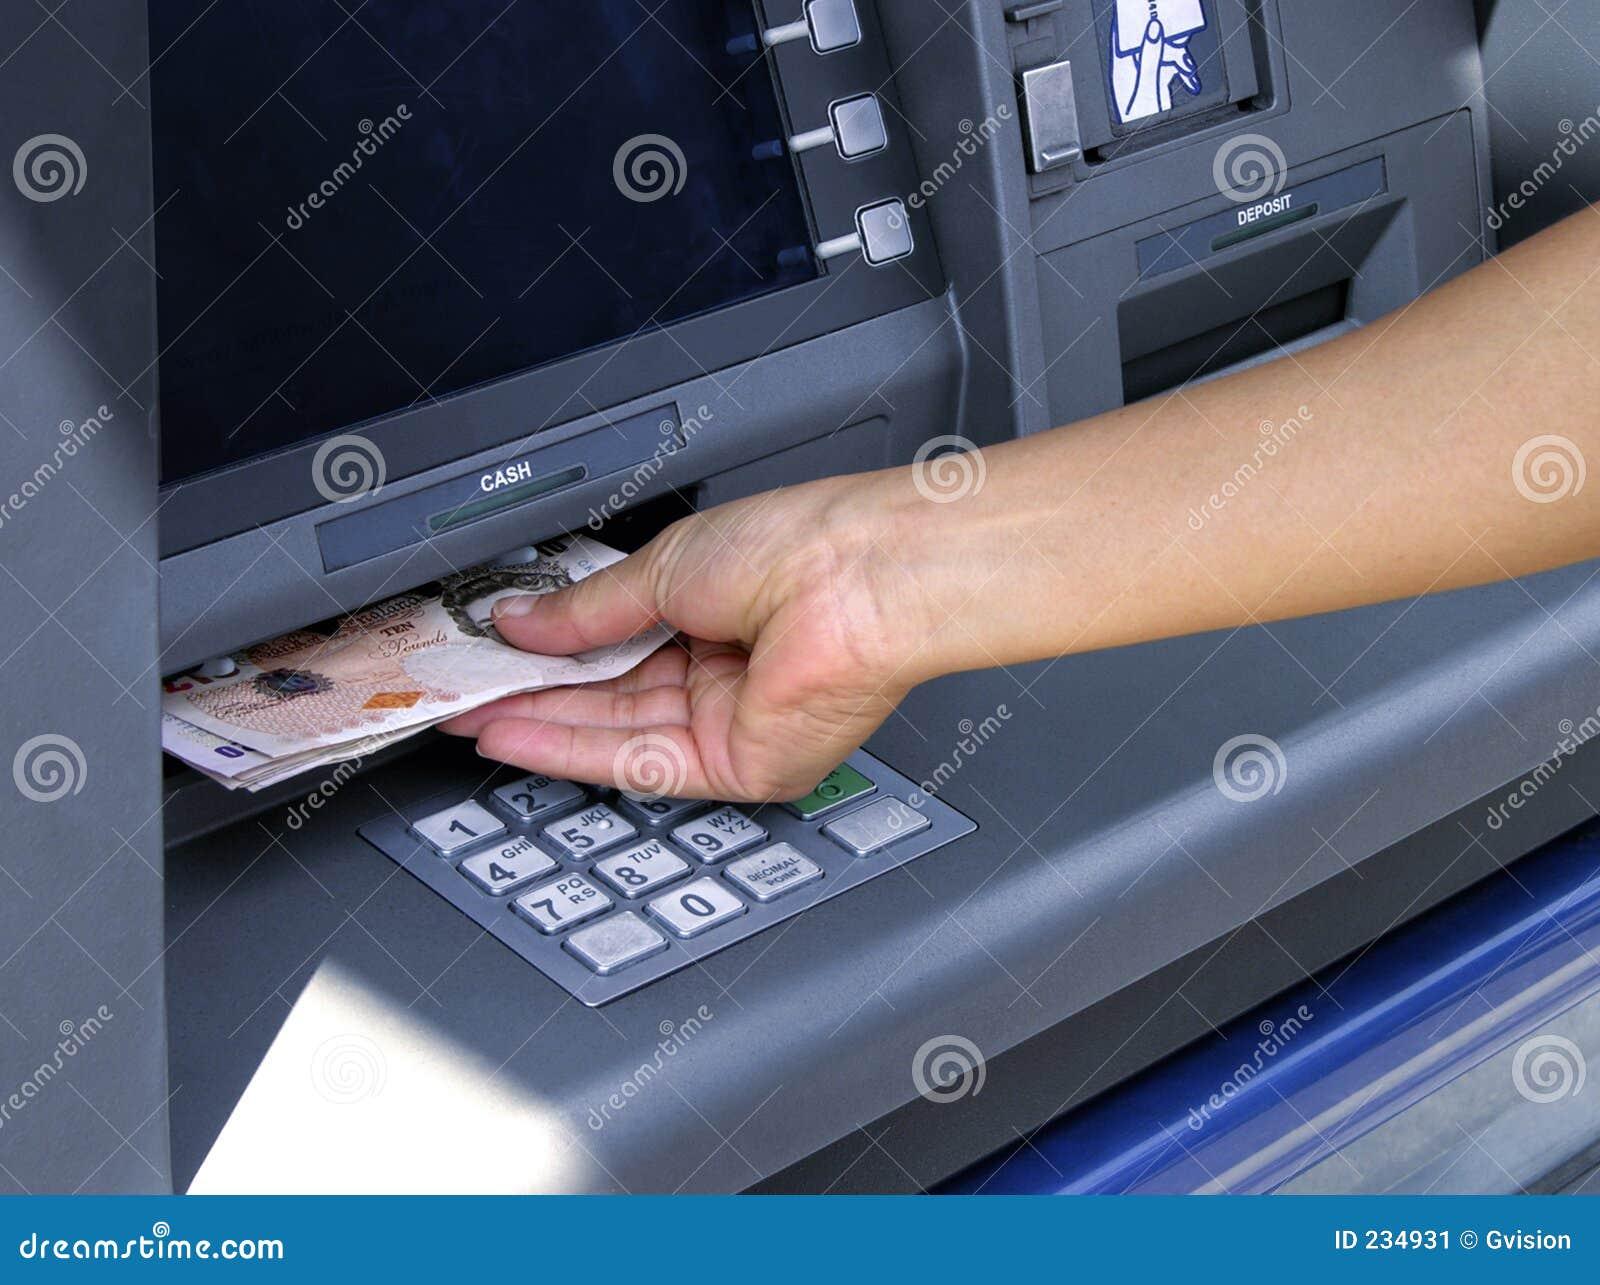 Máquina de efectivo